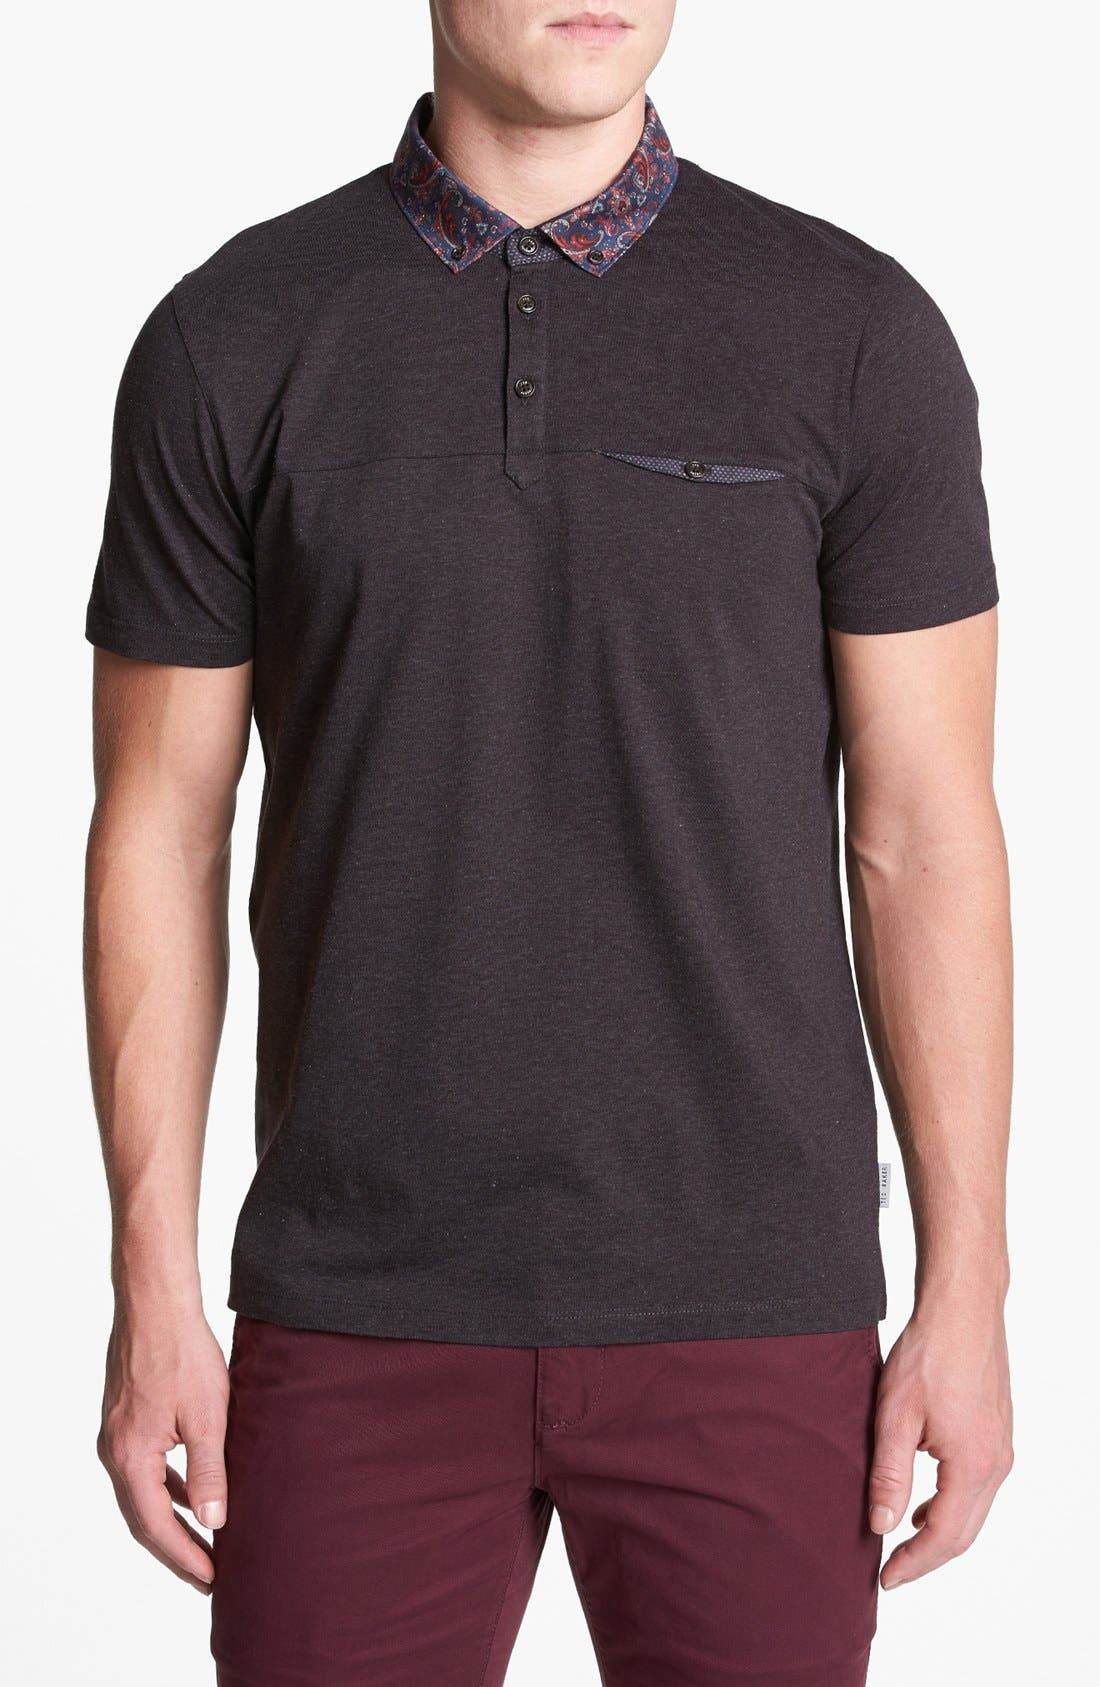 Main Image - Ted Baker London Woven Collar Polo Shirt